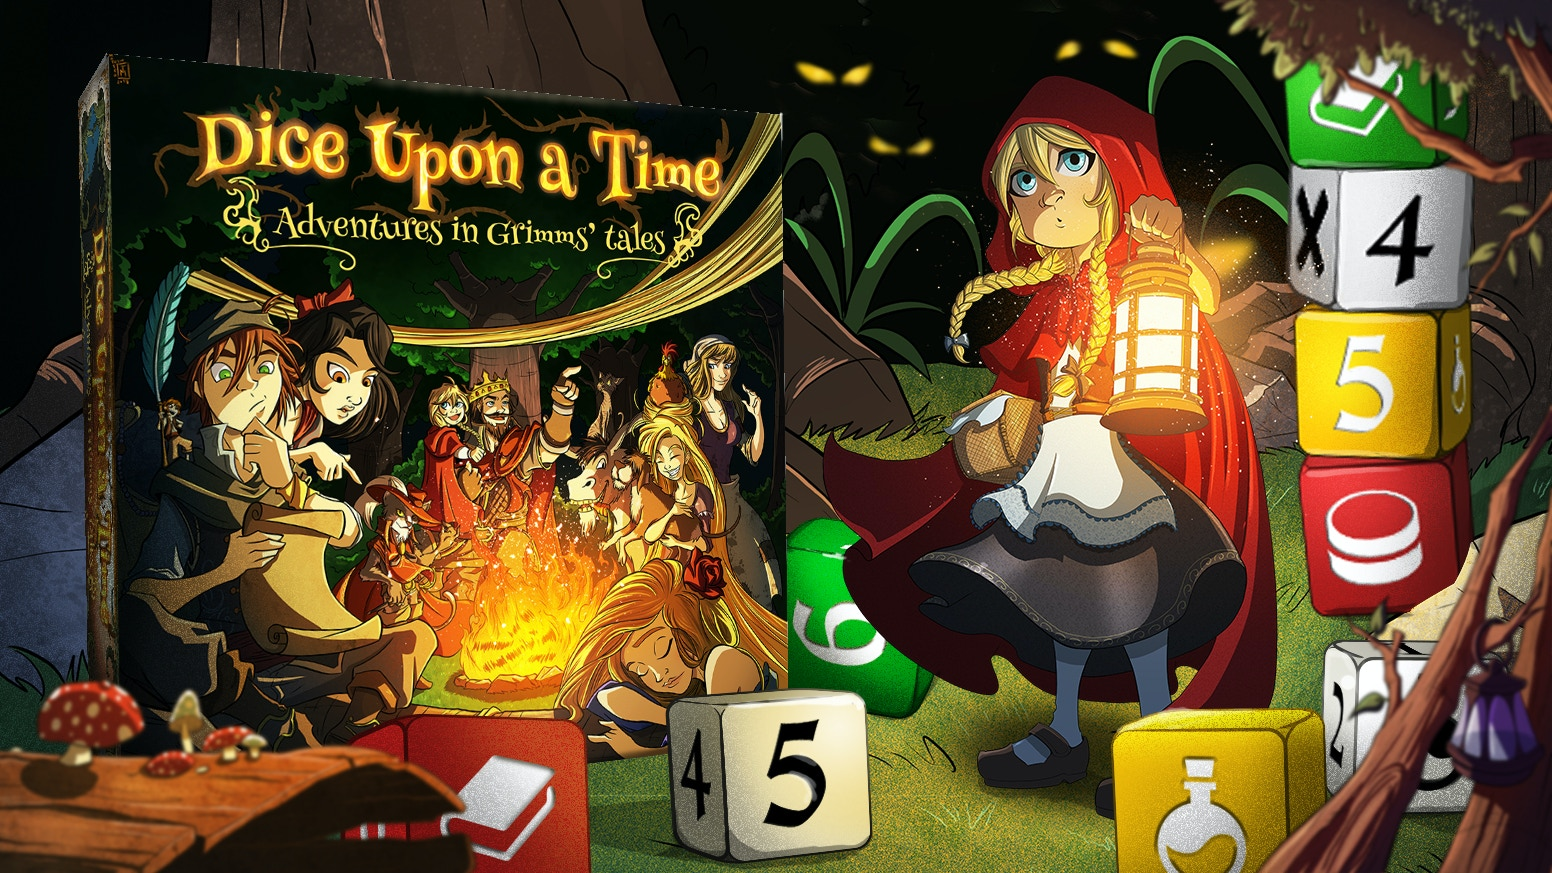 Adventures in Grimms' tales